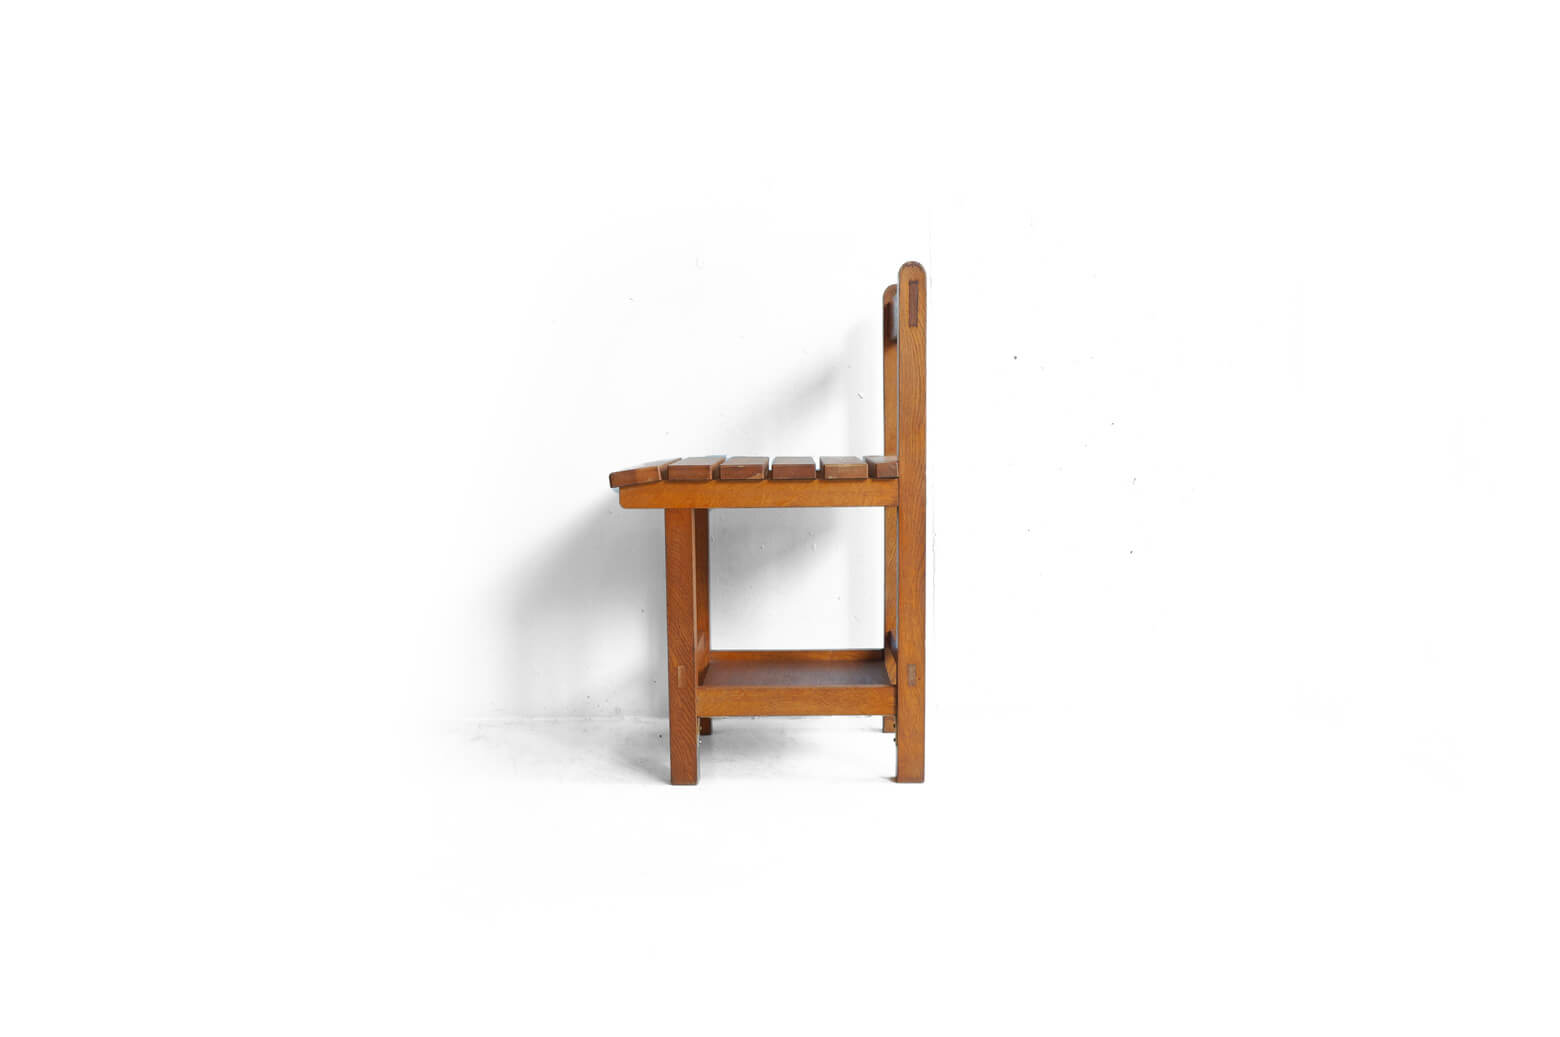 Vintage Wooden School Chair/ヴィンテージ スクールチェア 学校椅子 レトロ 2